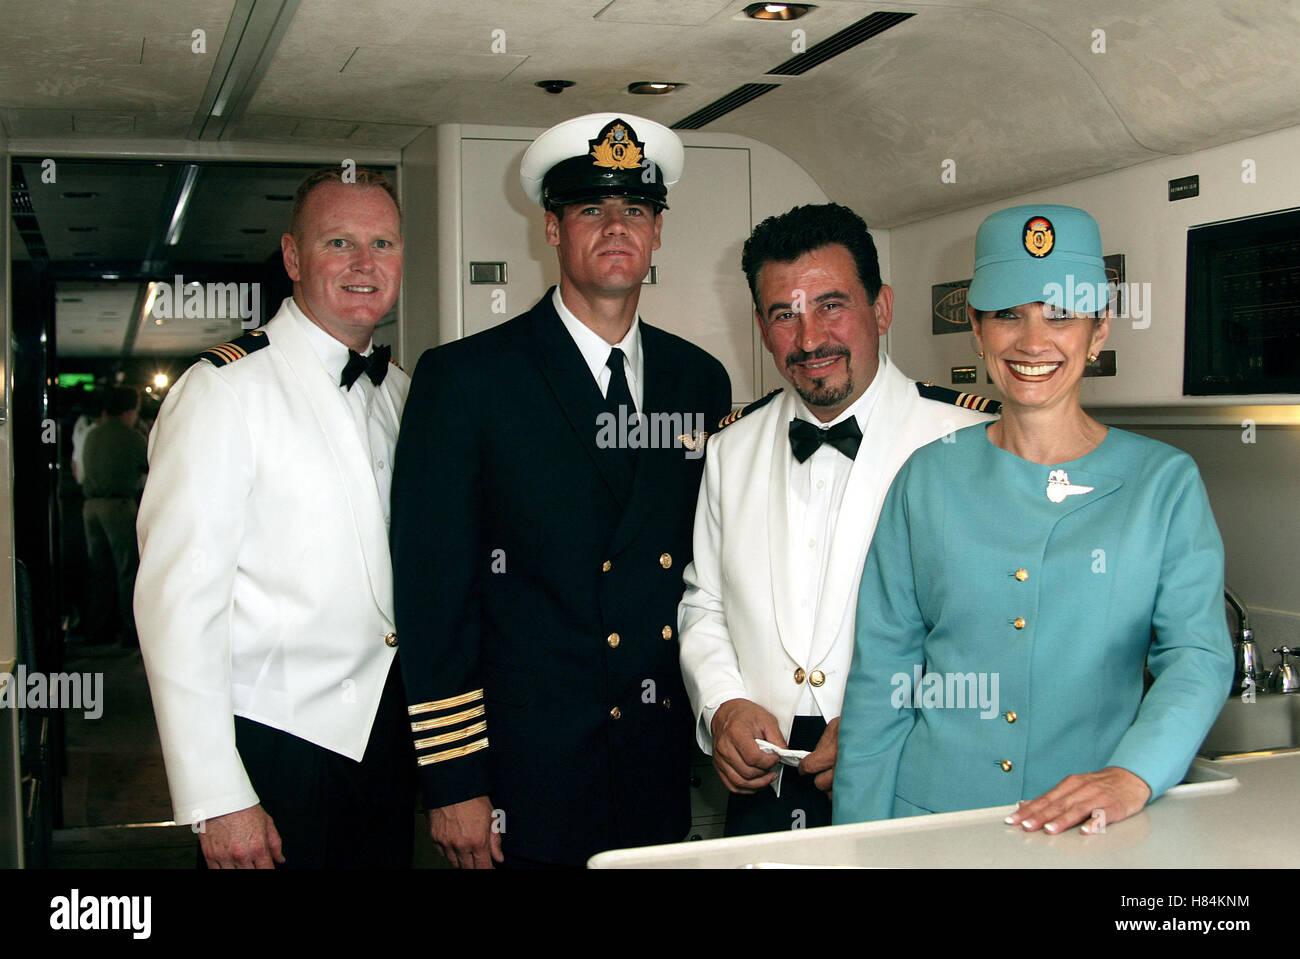 JOHN TRAVOLTA'S FLIGHT CREW QANTAS AMMASSADOR AT LARGE LOS ANGELES AIRPORT [LAX] LOS ANGELES USA 24 June 2002 - Stock Image